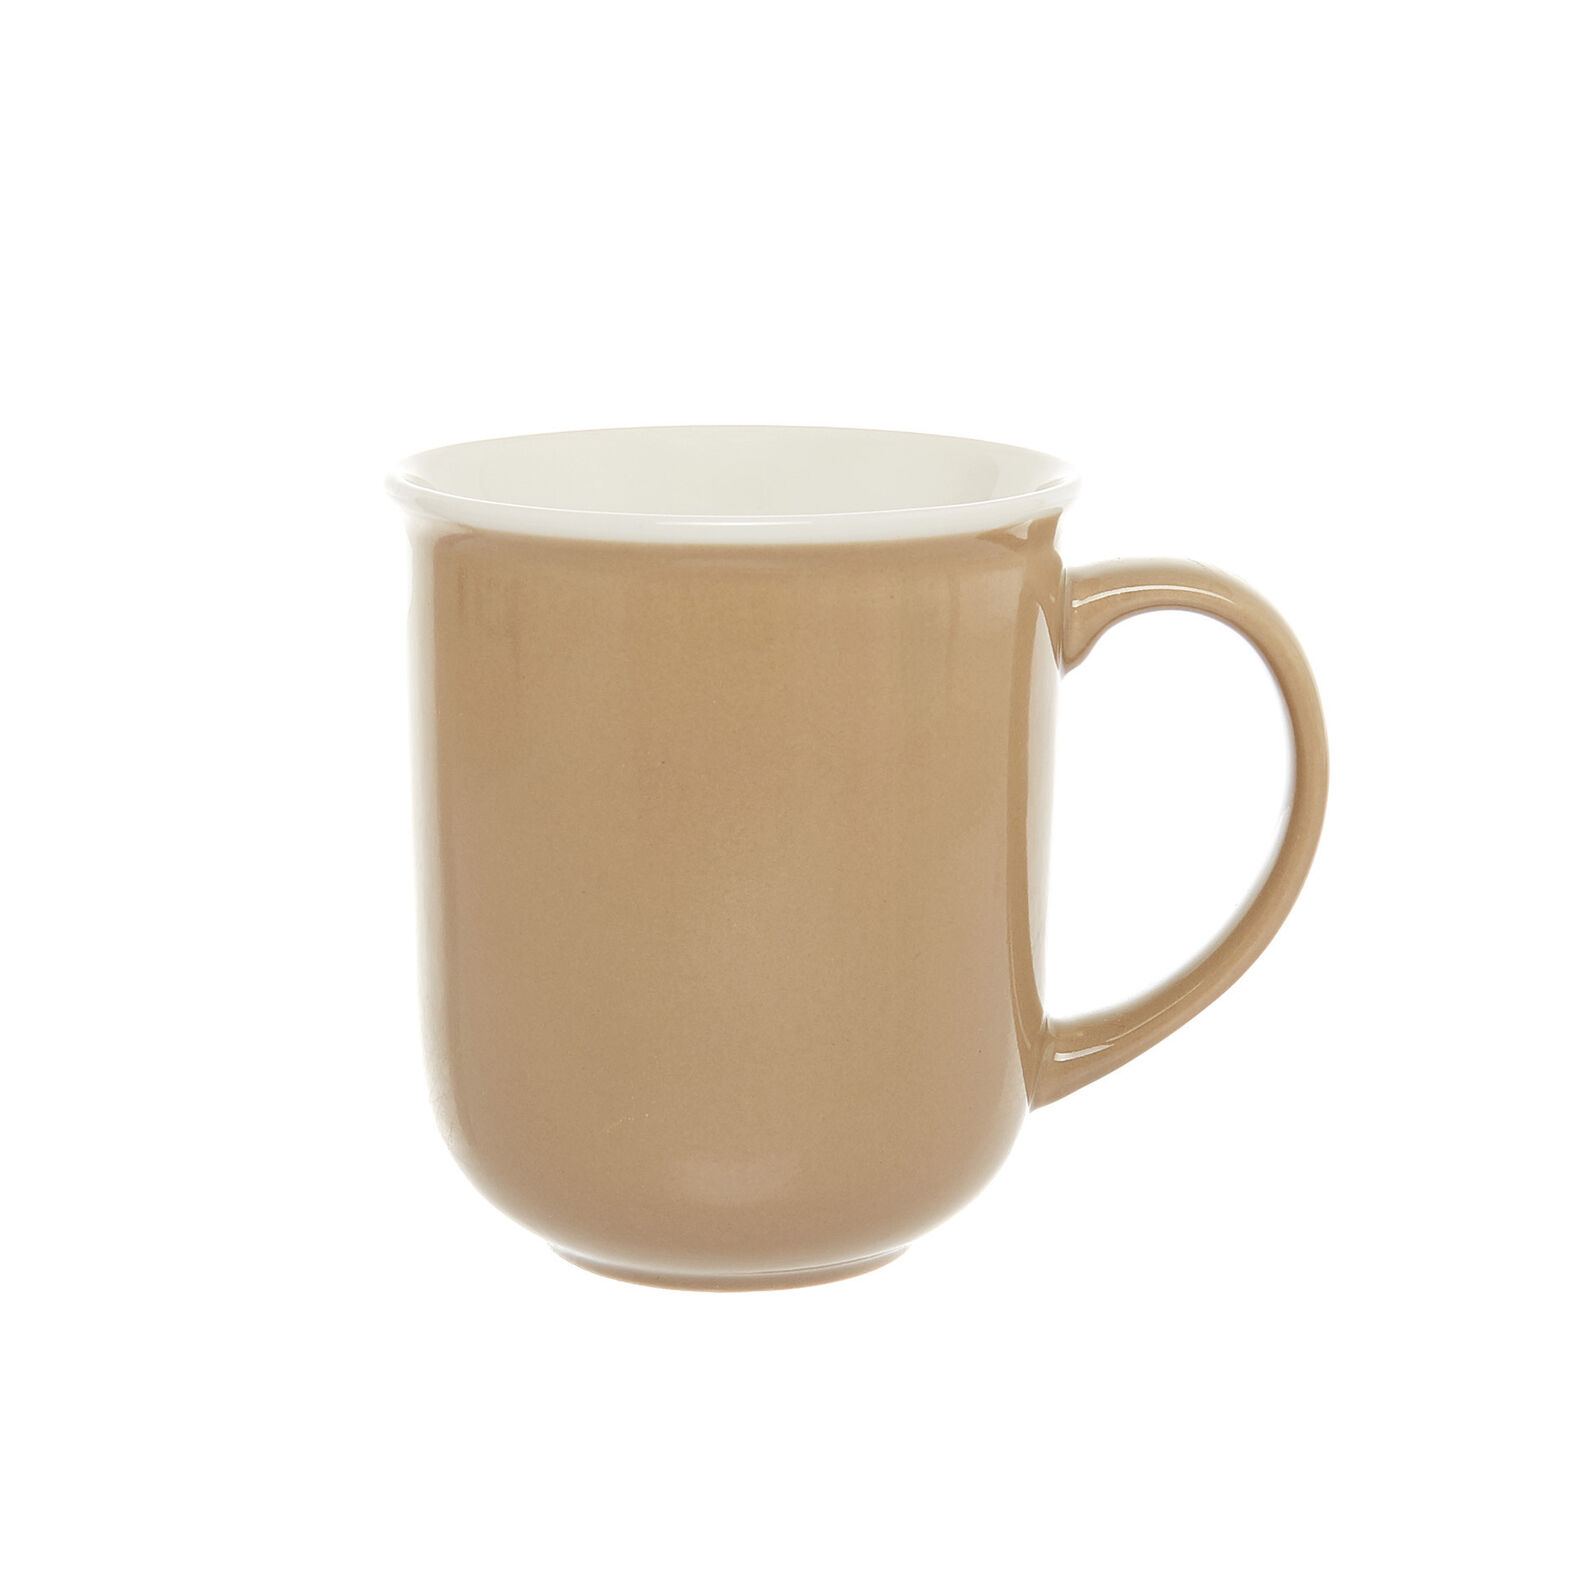 Solid colour mug in new bone China